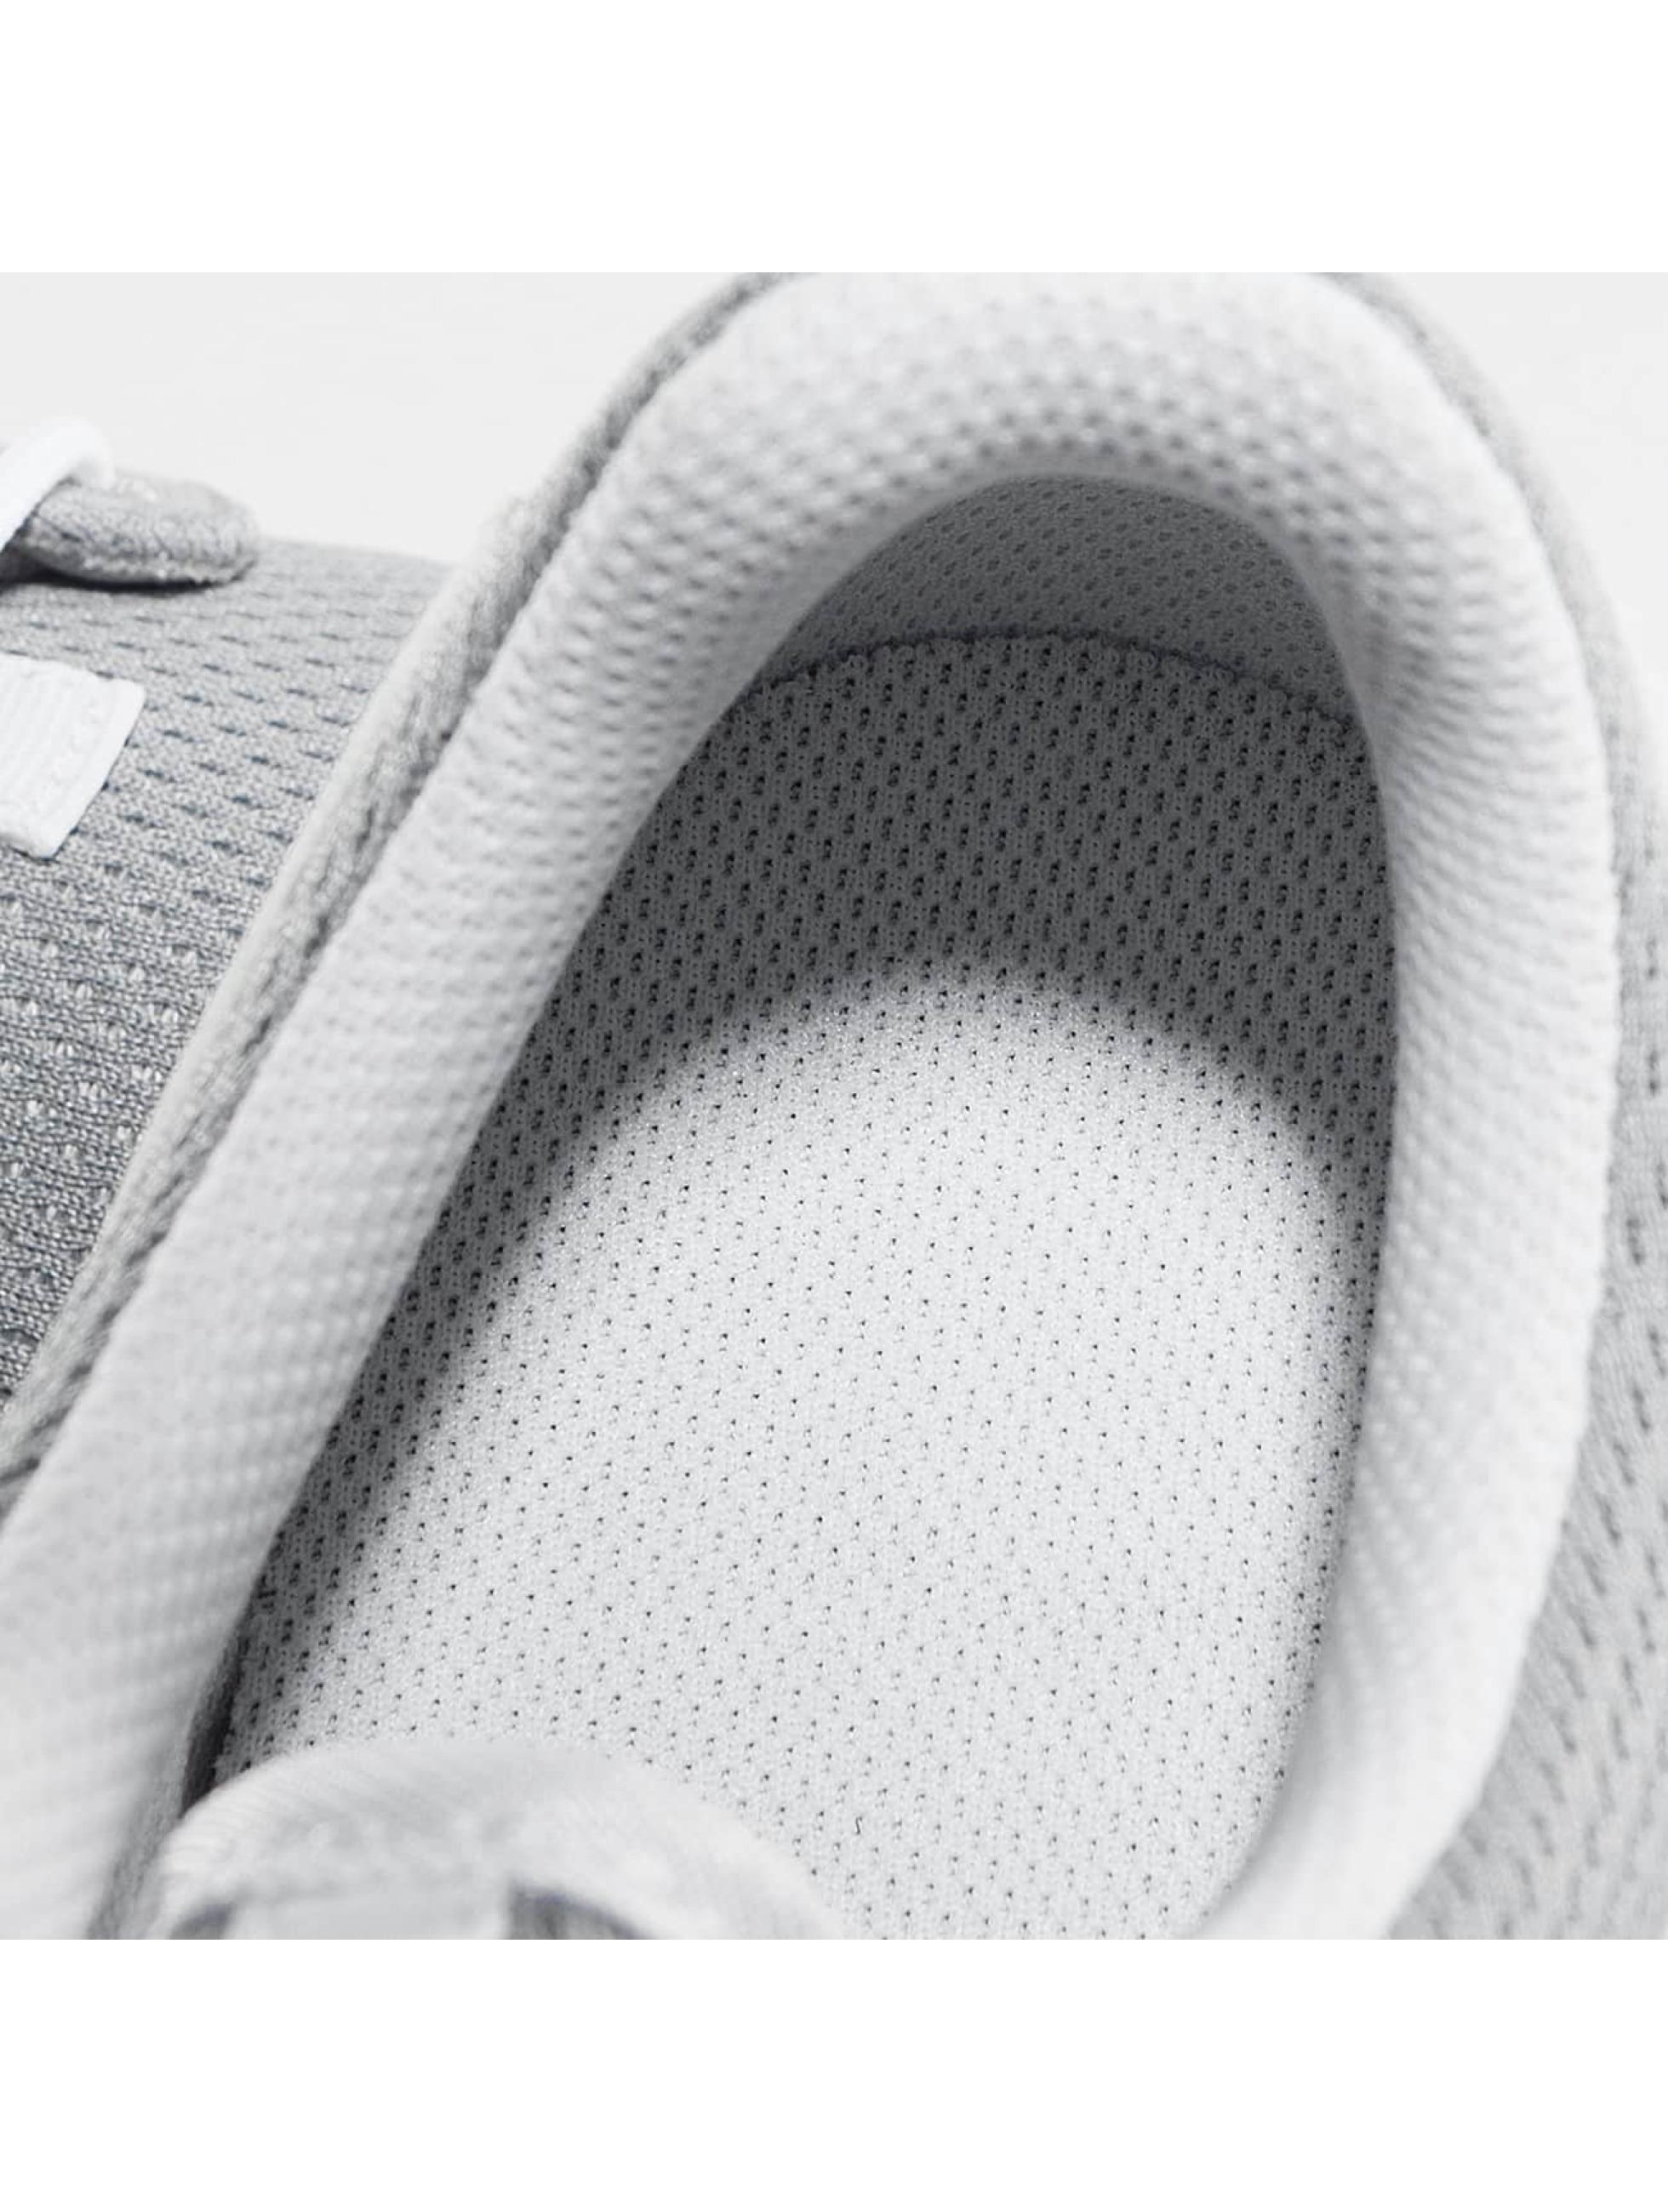 Nike Sneakers Roshe One gray